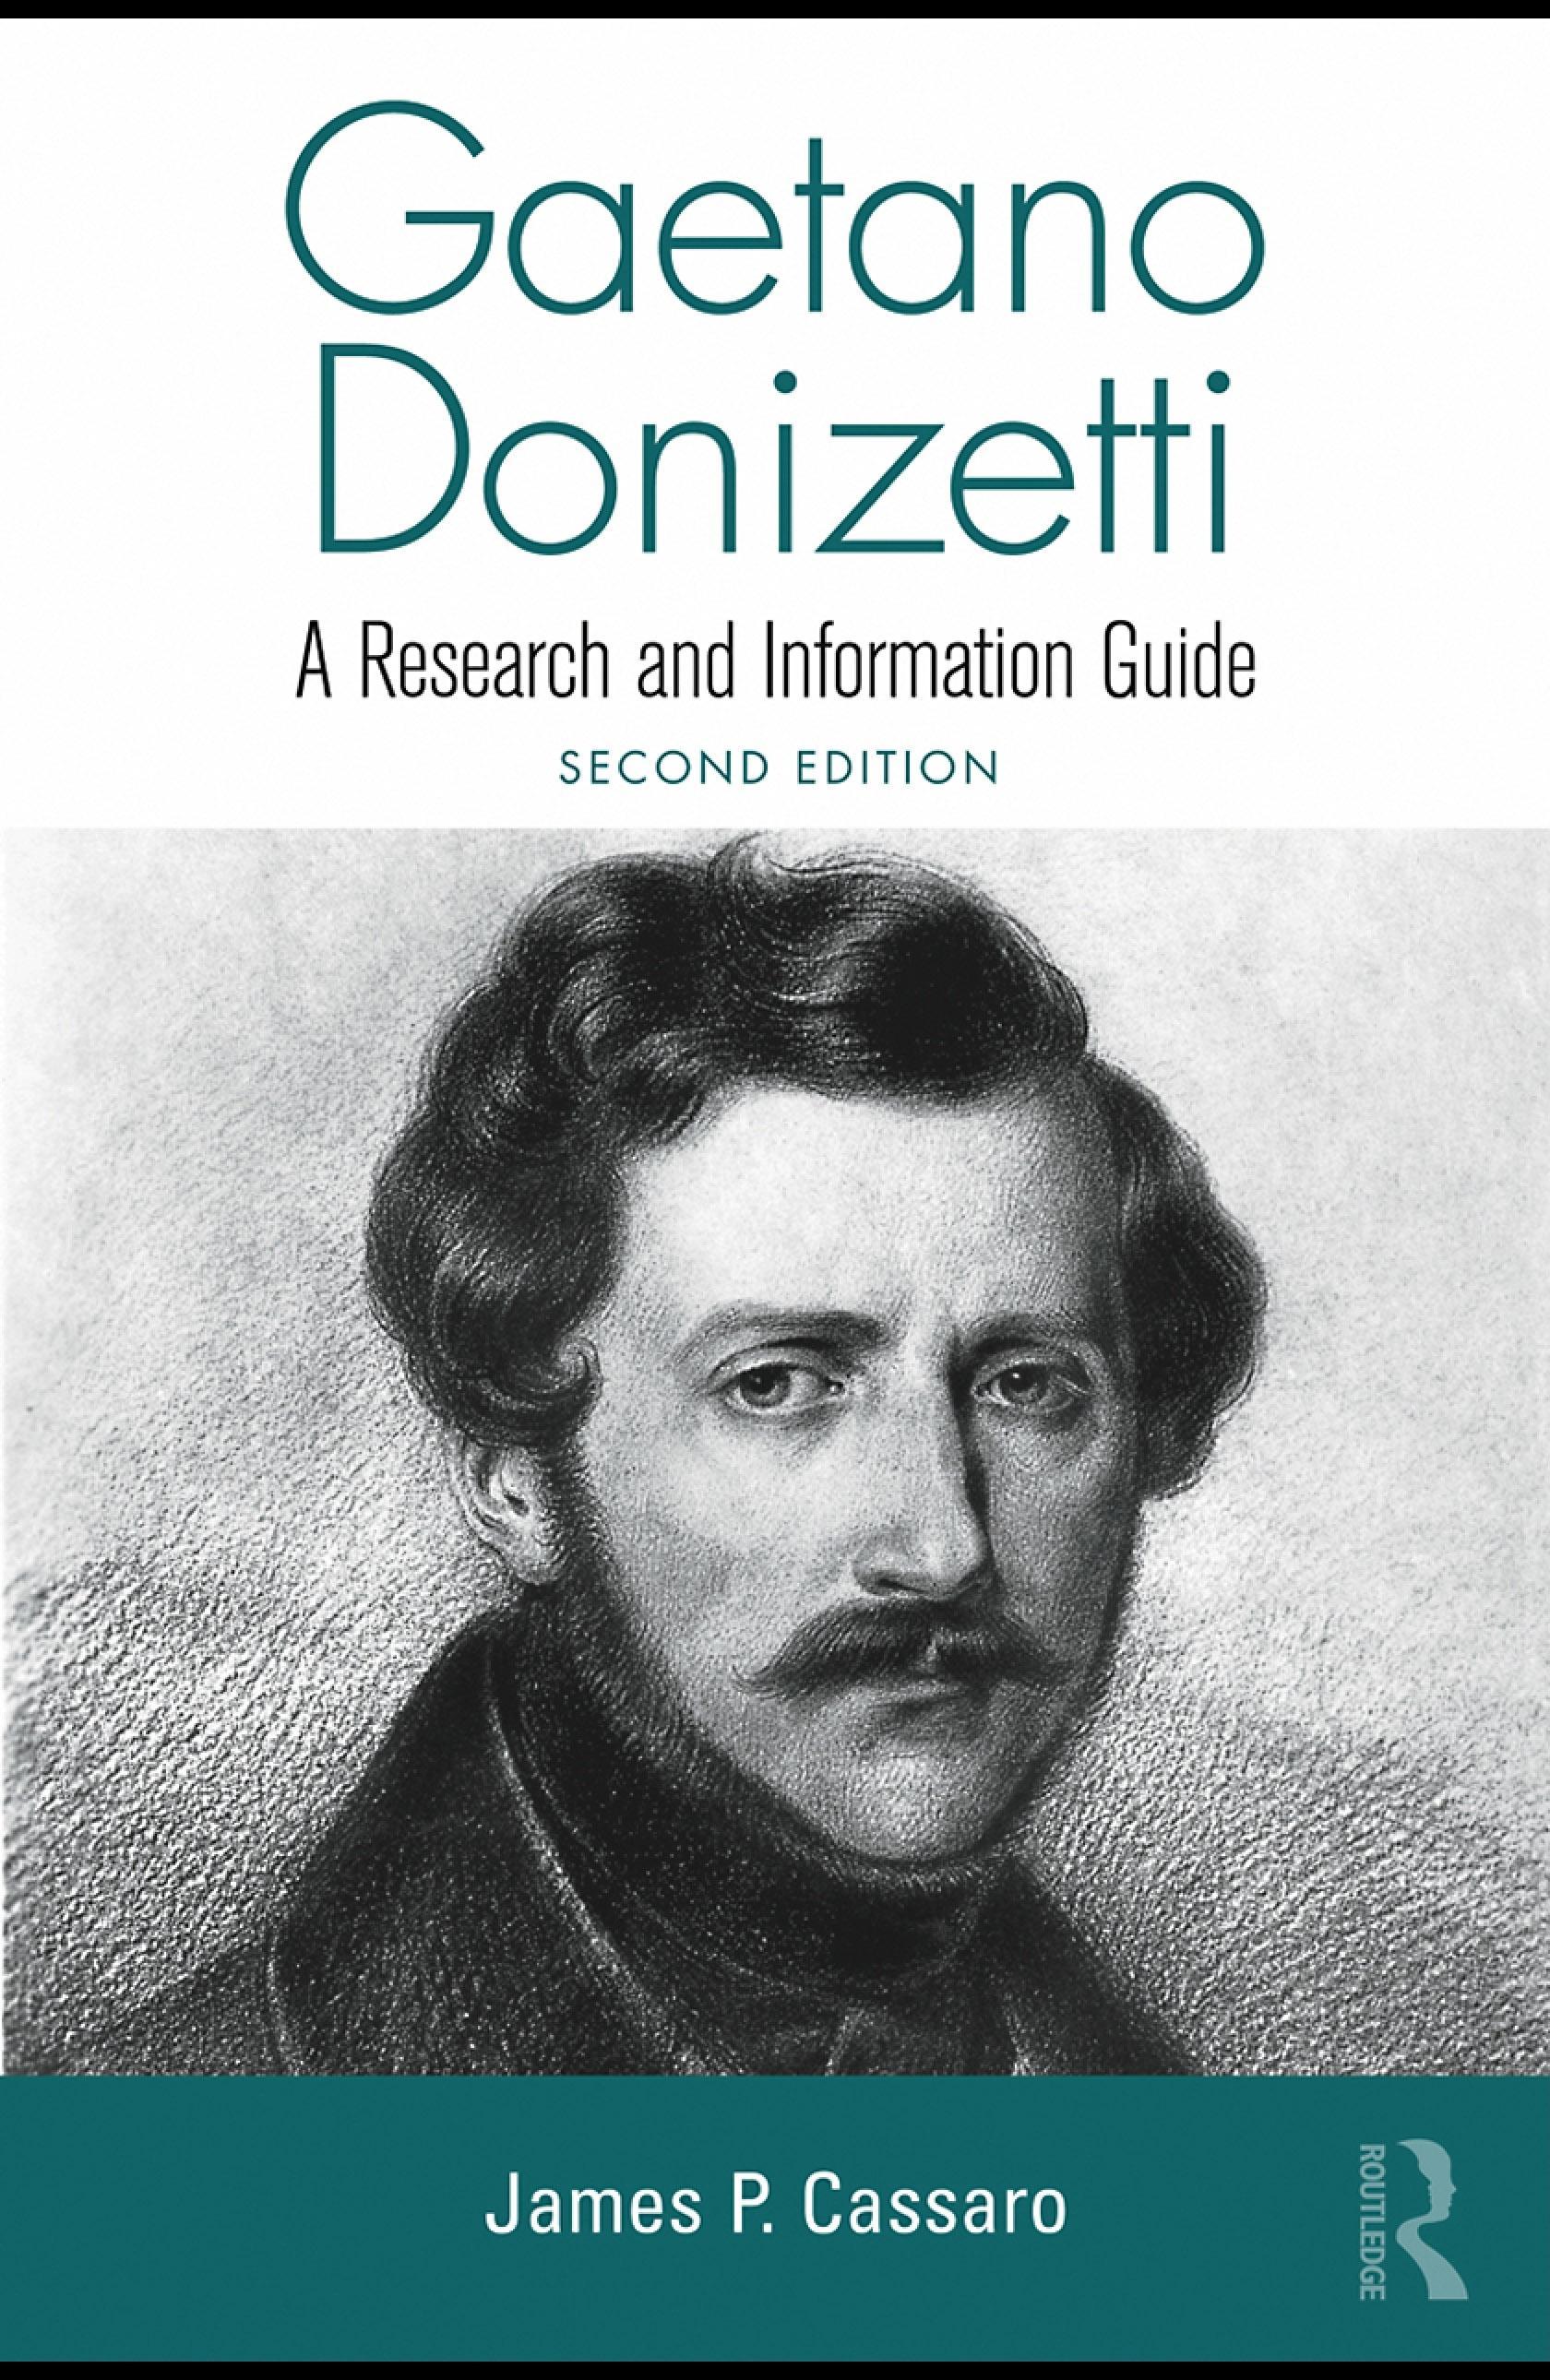 Gaetano Donizetti: A Research and Information Guide EB9780203890417